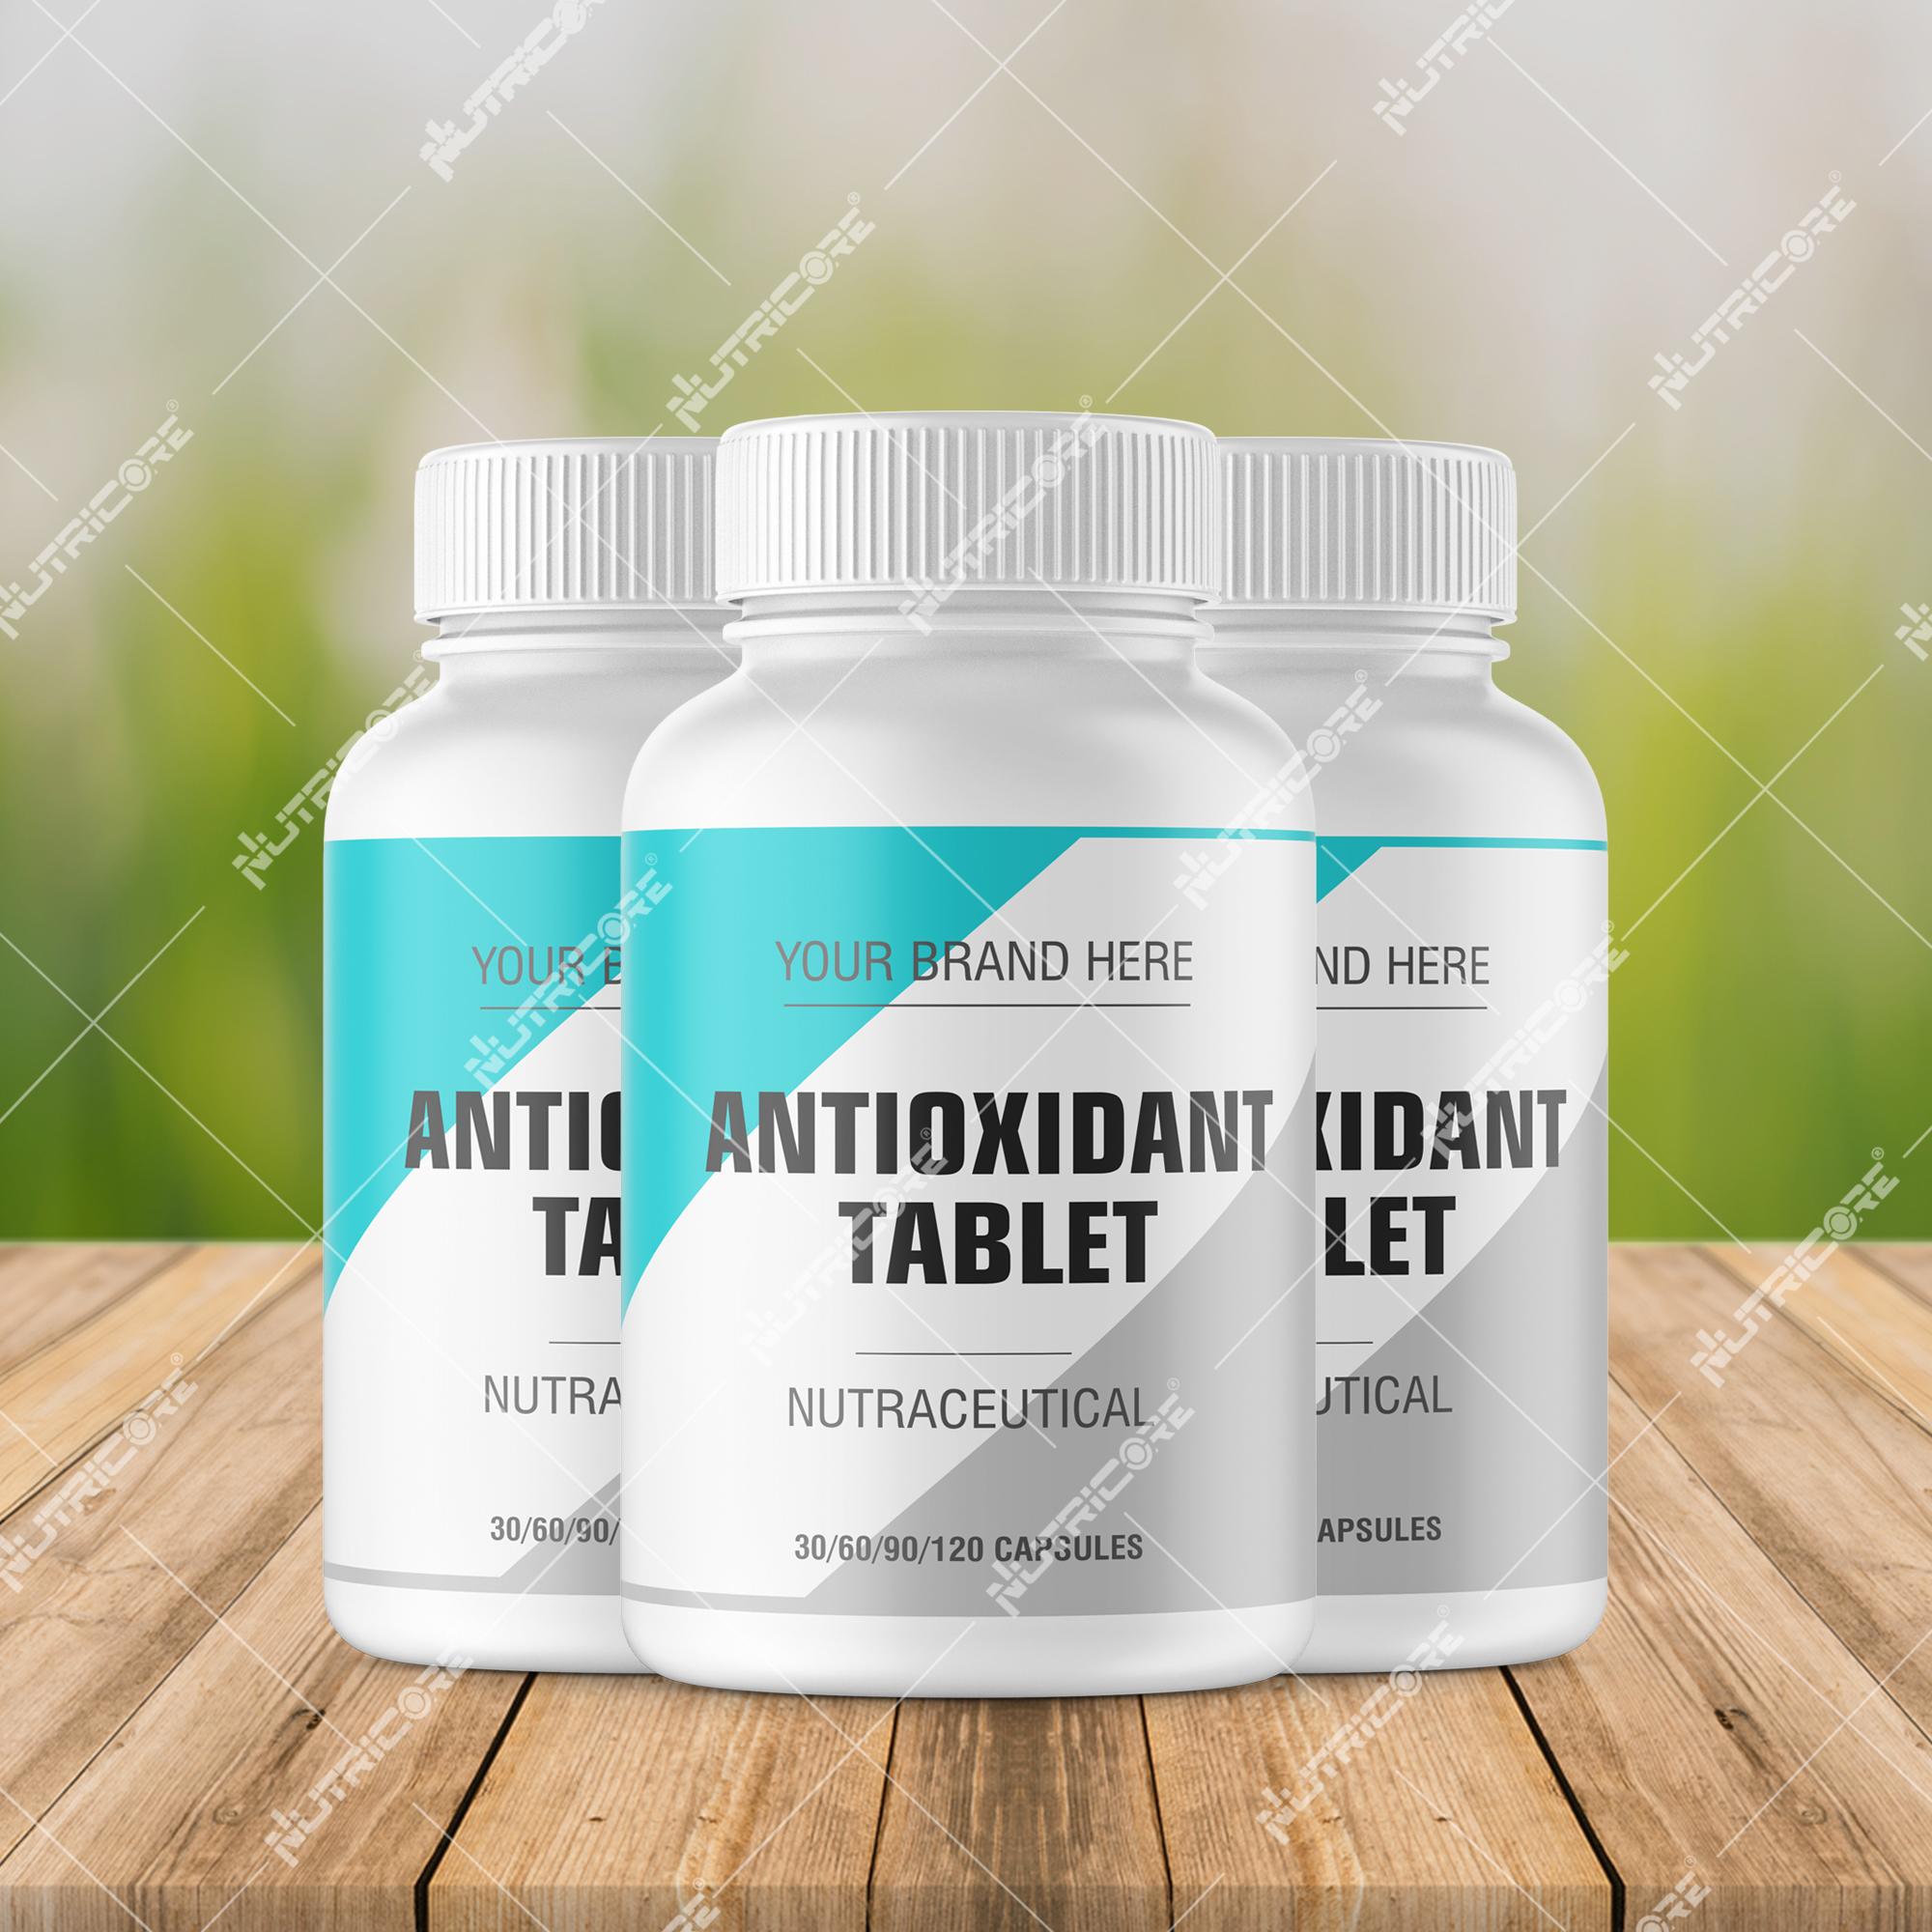 Antioxidant Tablet